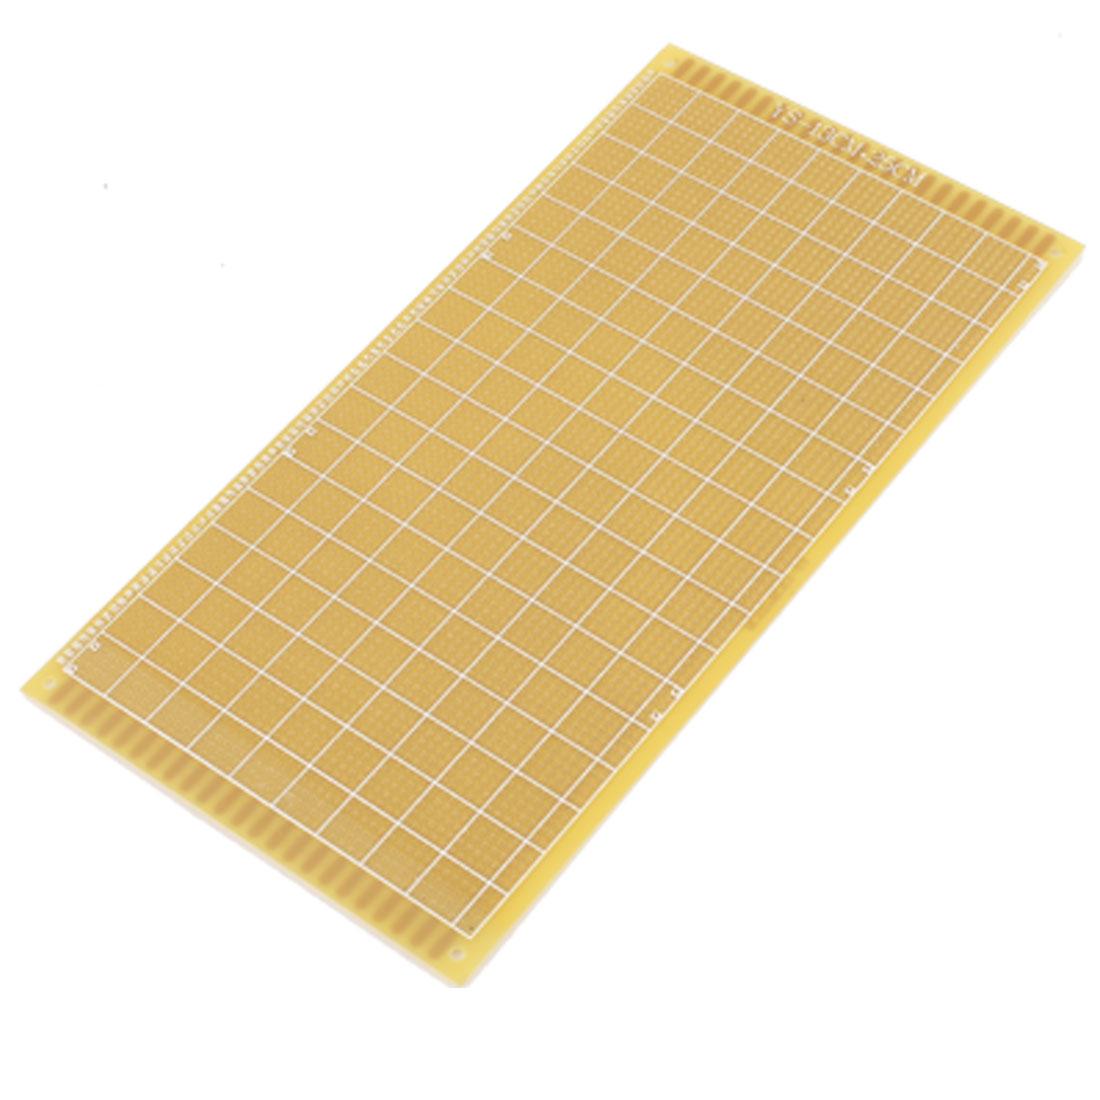 Single-sided PCB Printed Circuit Board Prototype Breadboard 25cm x 13cm